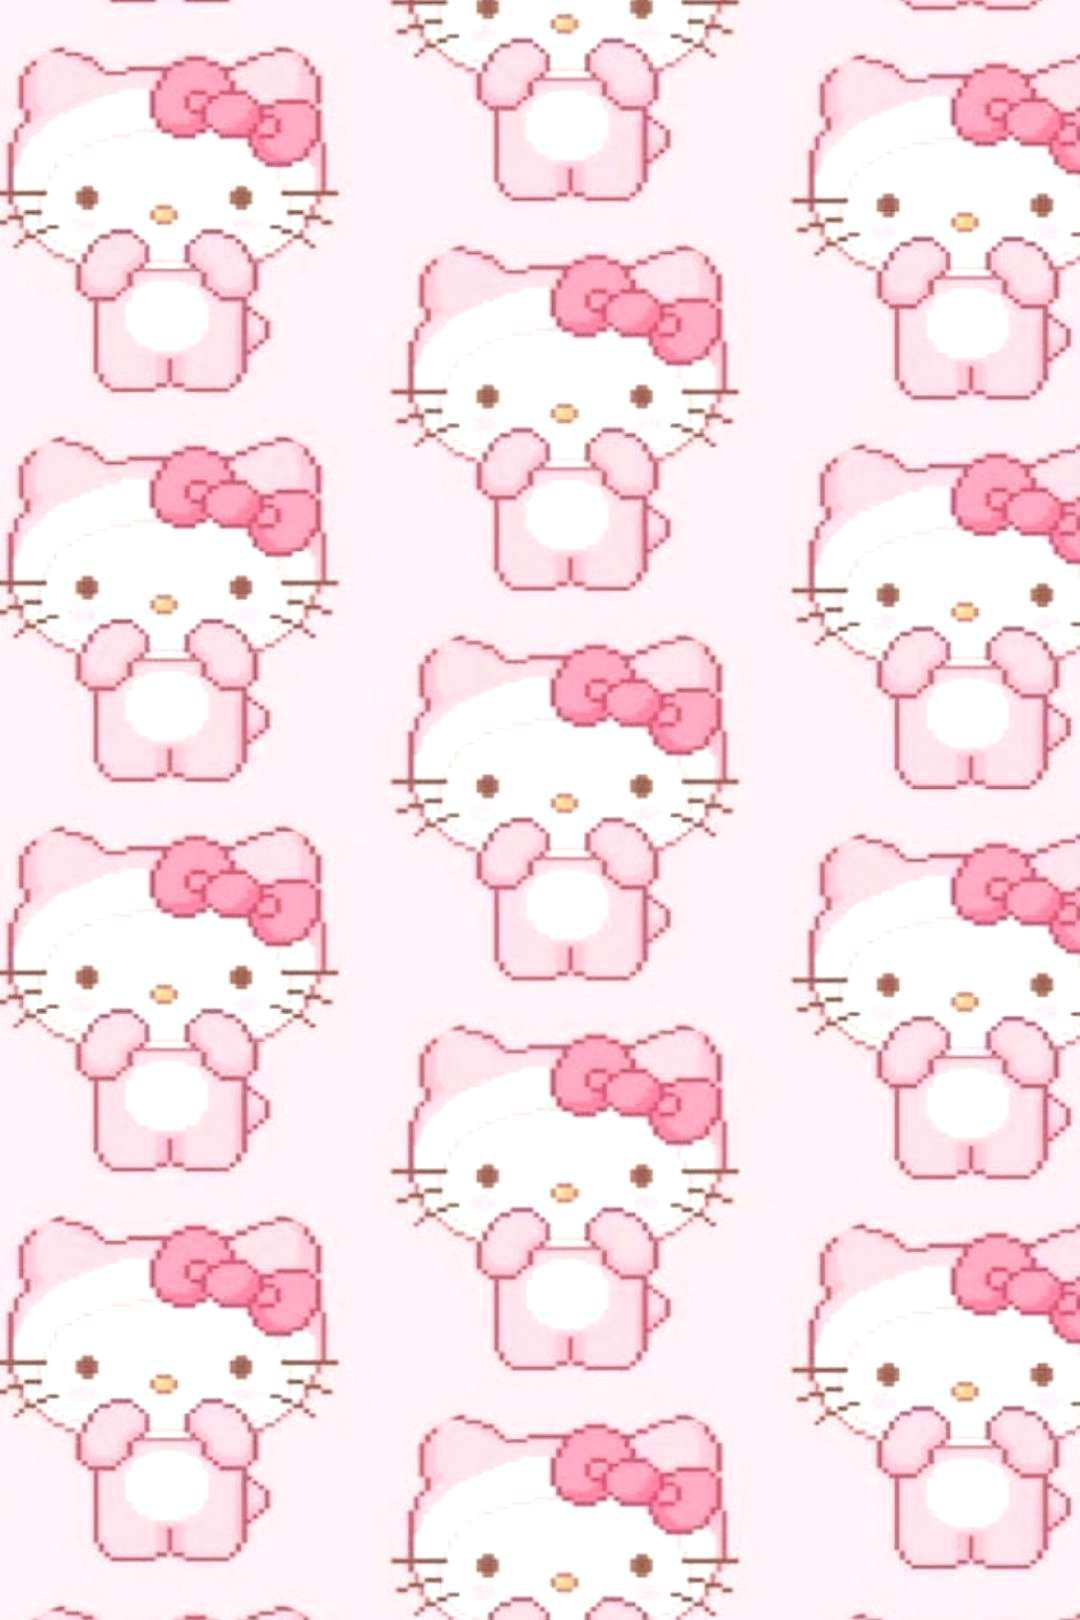 Rosa Hello Kitty WallpaperhelloYou can find Kitty and more on our websiteRosa Hello Kitty Wallpaperhello